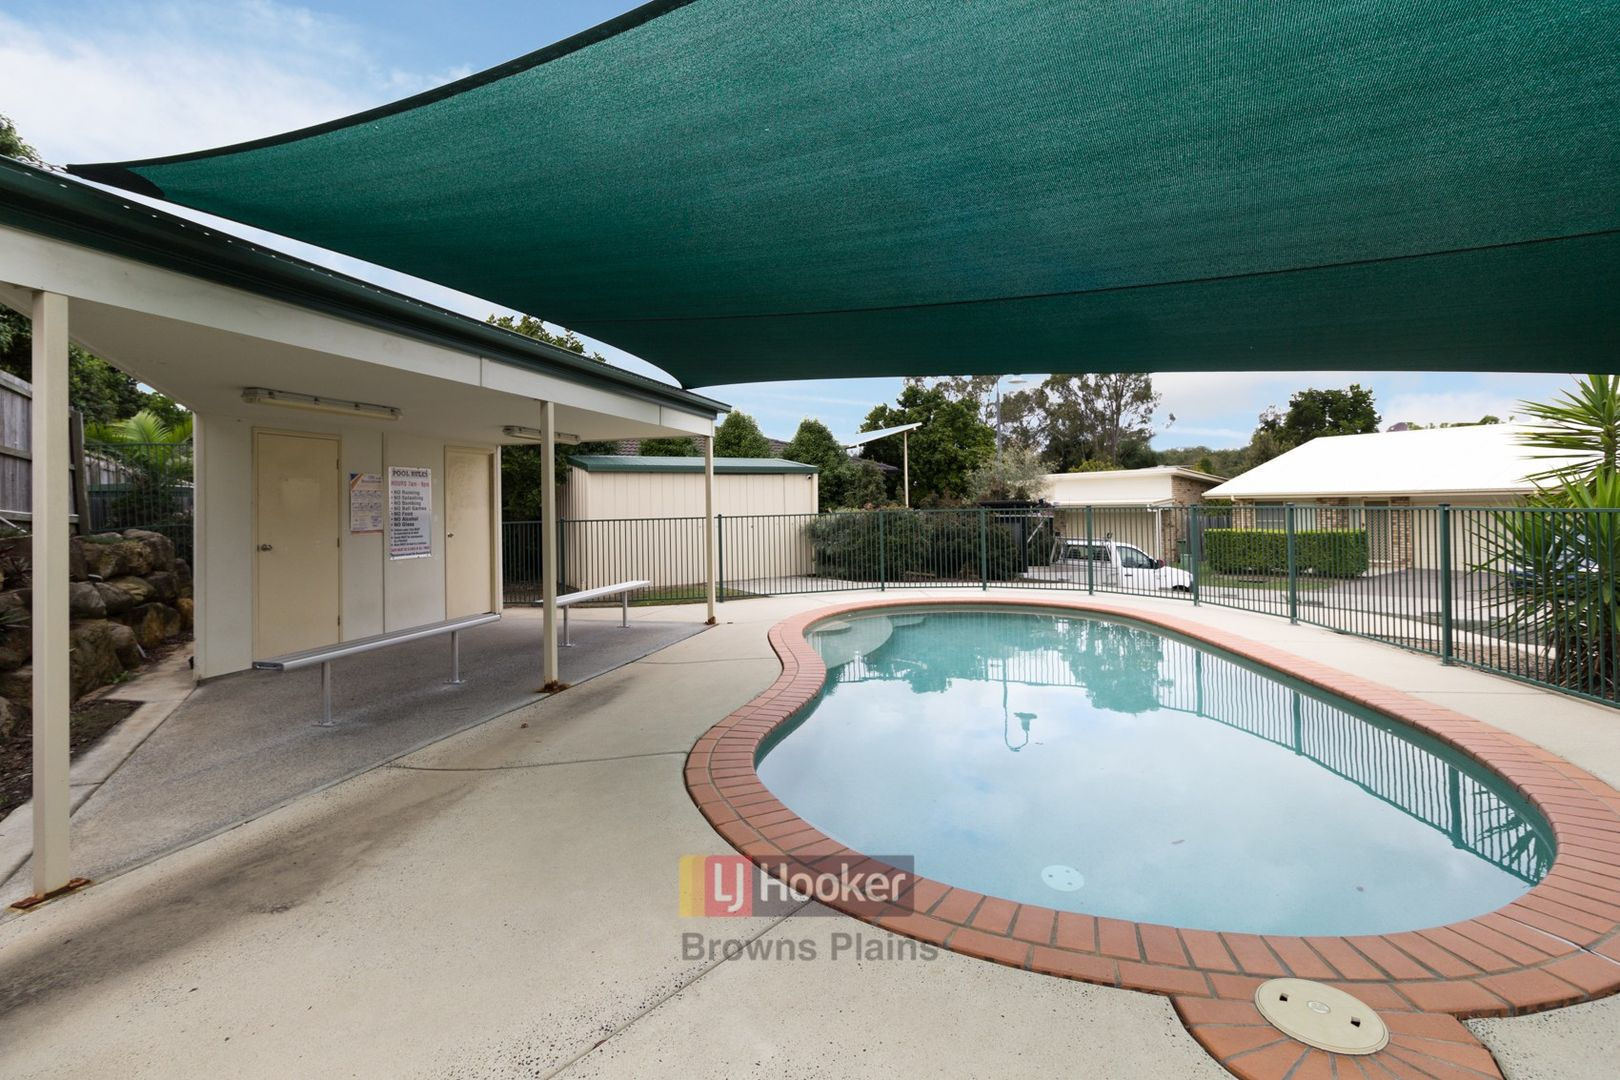 29/54-64 Short Street, Boronia Heights QLD 4124, Image 2